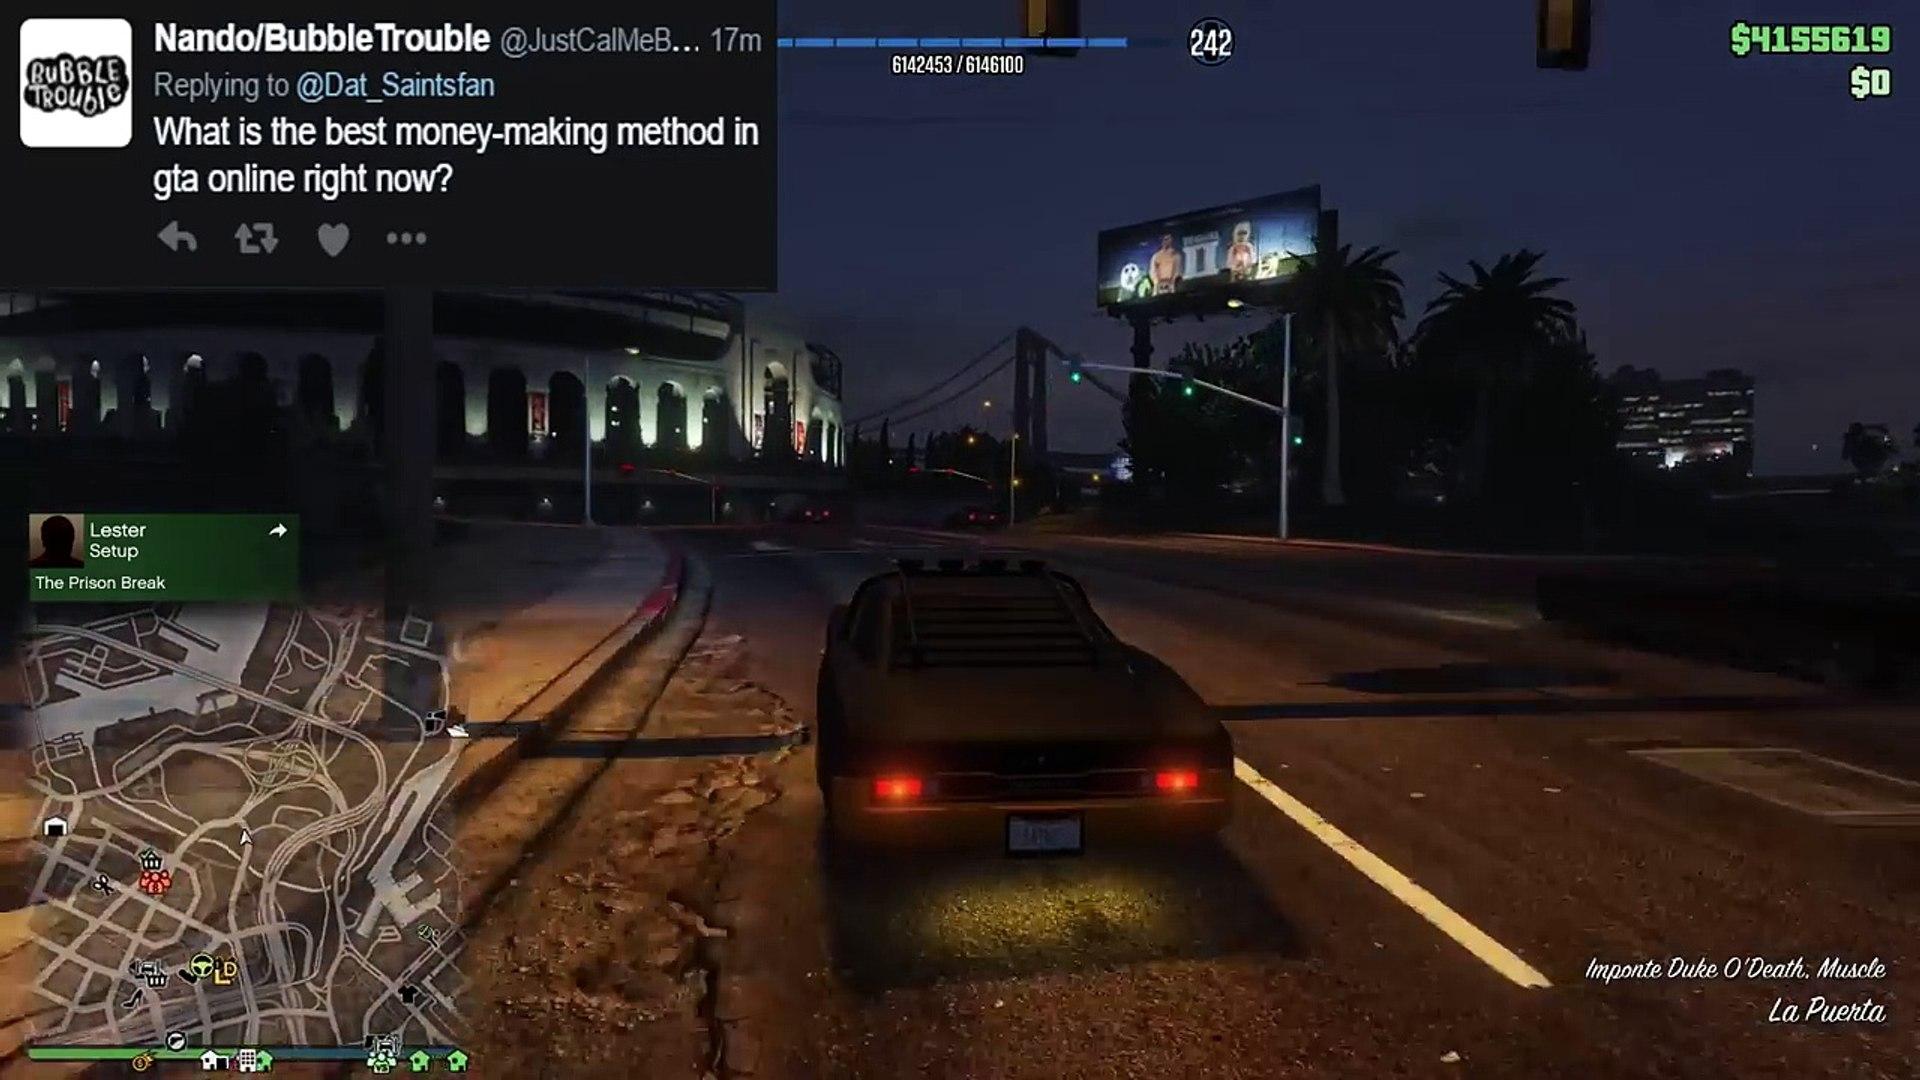 GUN RUNNING DLC PART OF MC BUSINESS, SEA SPARROW W/ GUNS & MORE (GTA 5 Q&A)